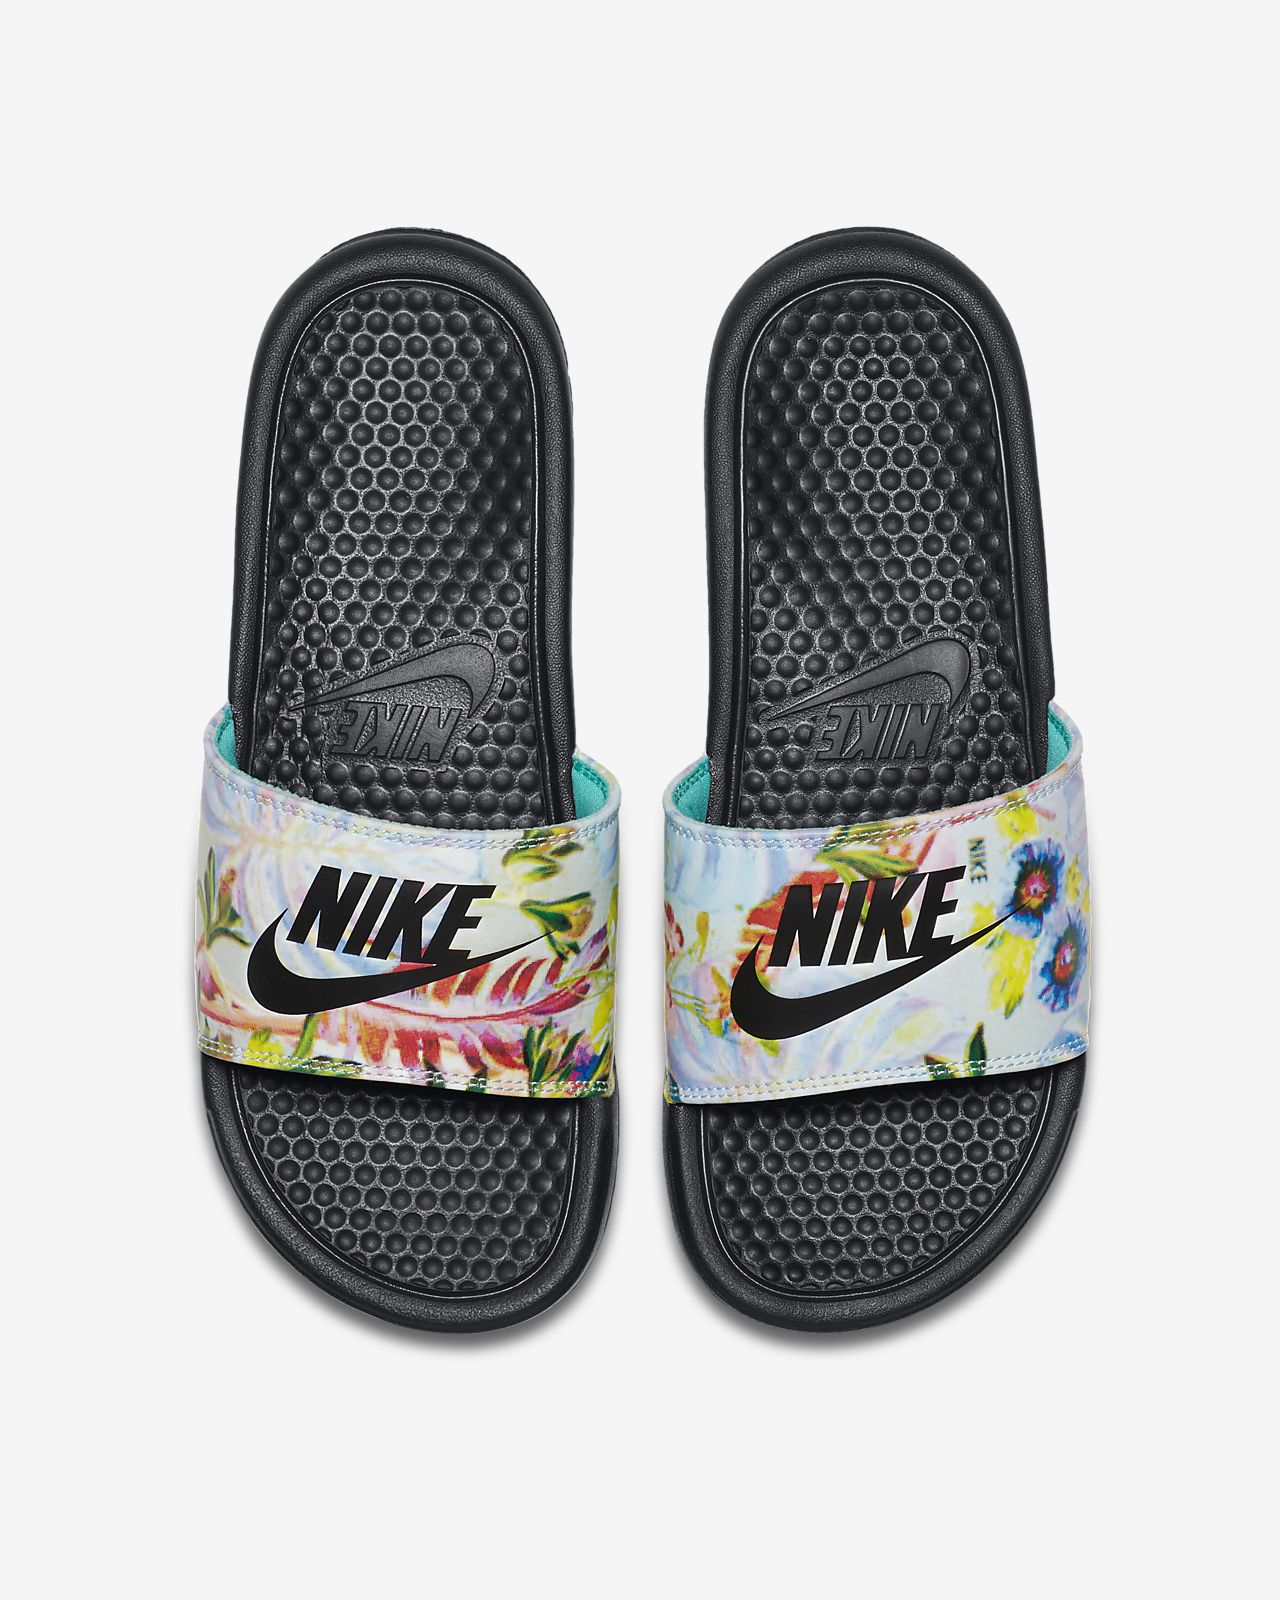 Nike Benassi jdi print on jodycruise store